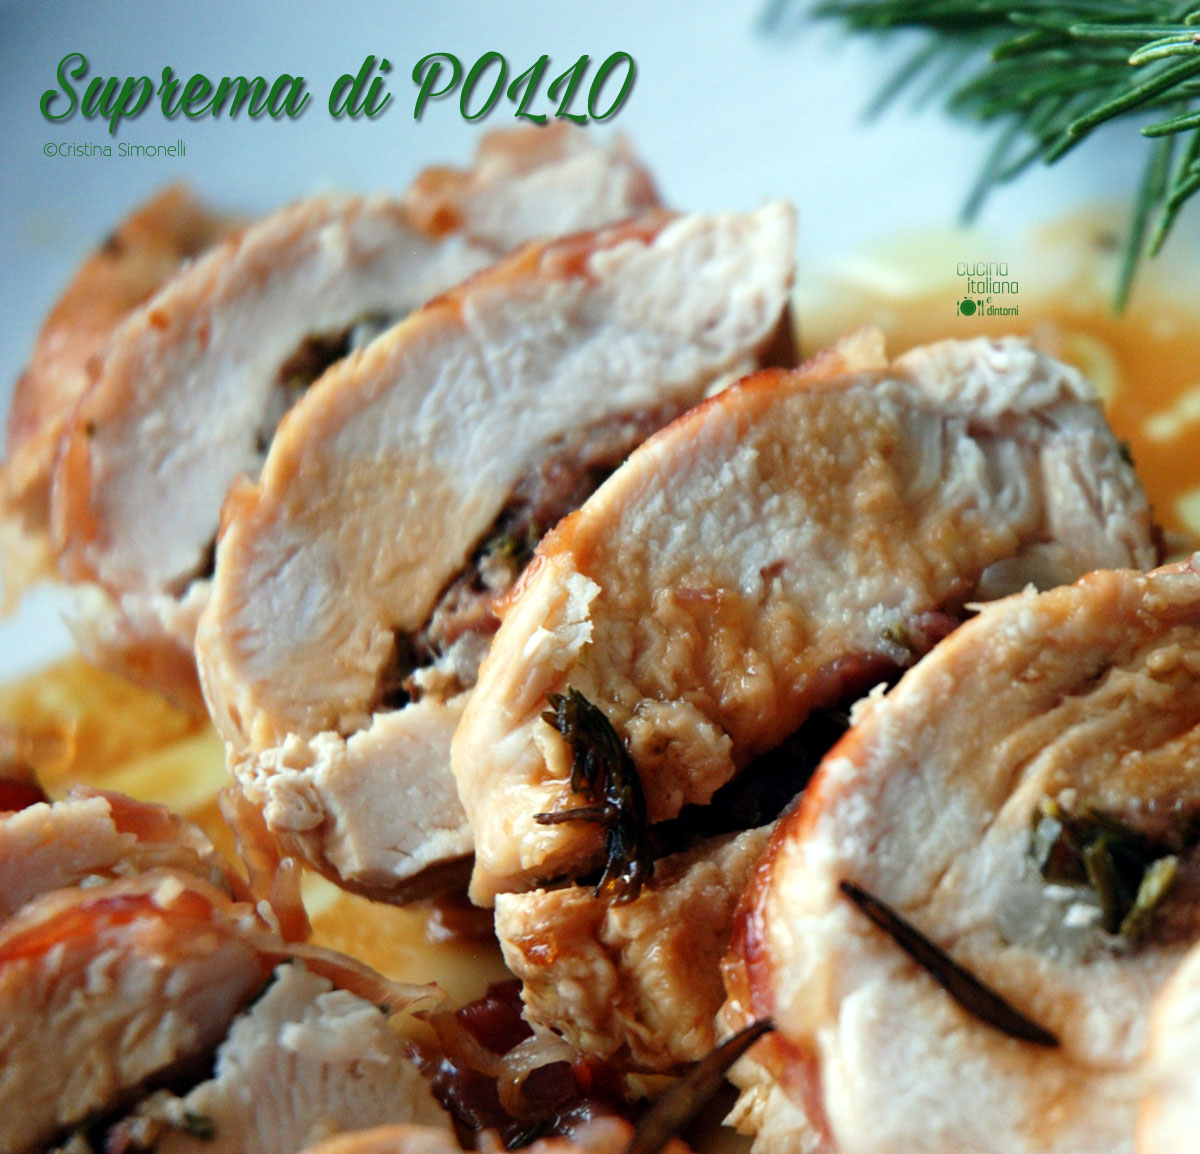 Cucina italiana e dintorni